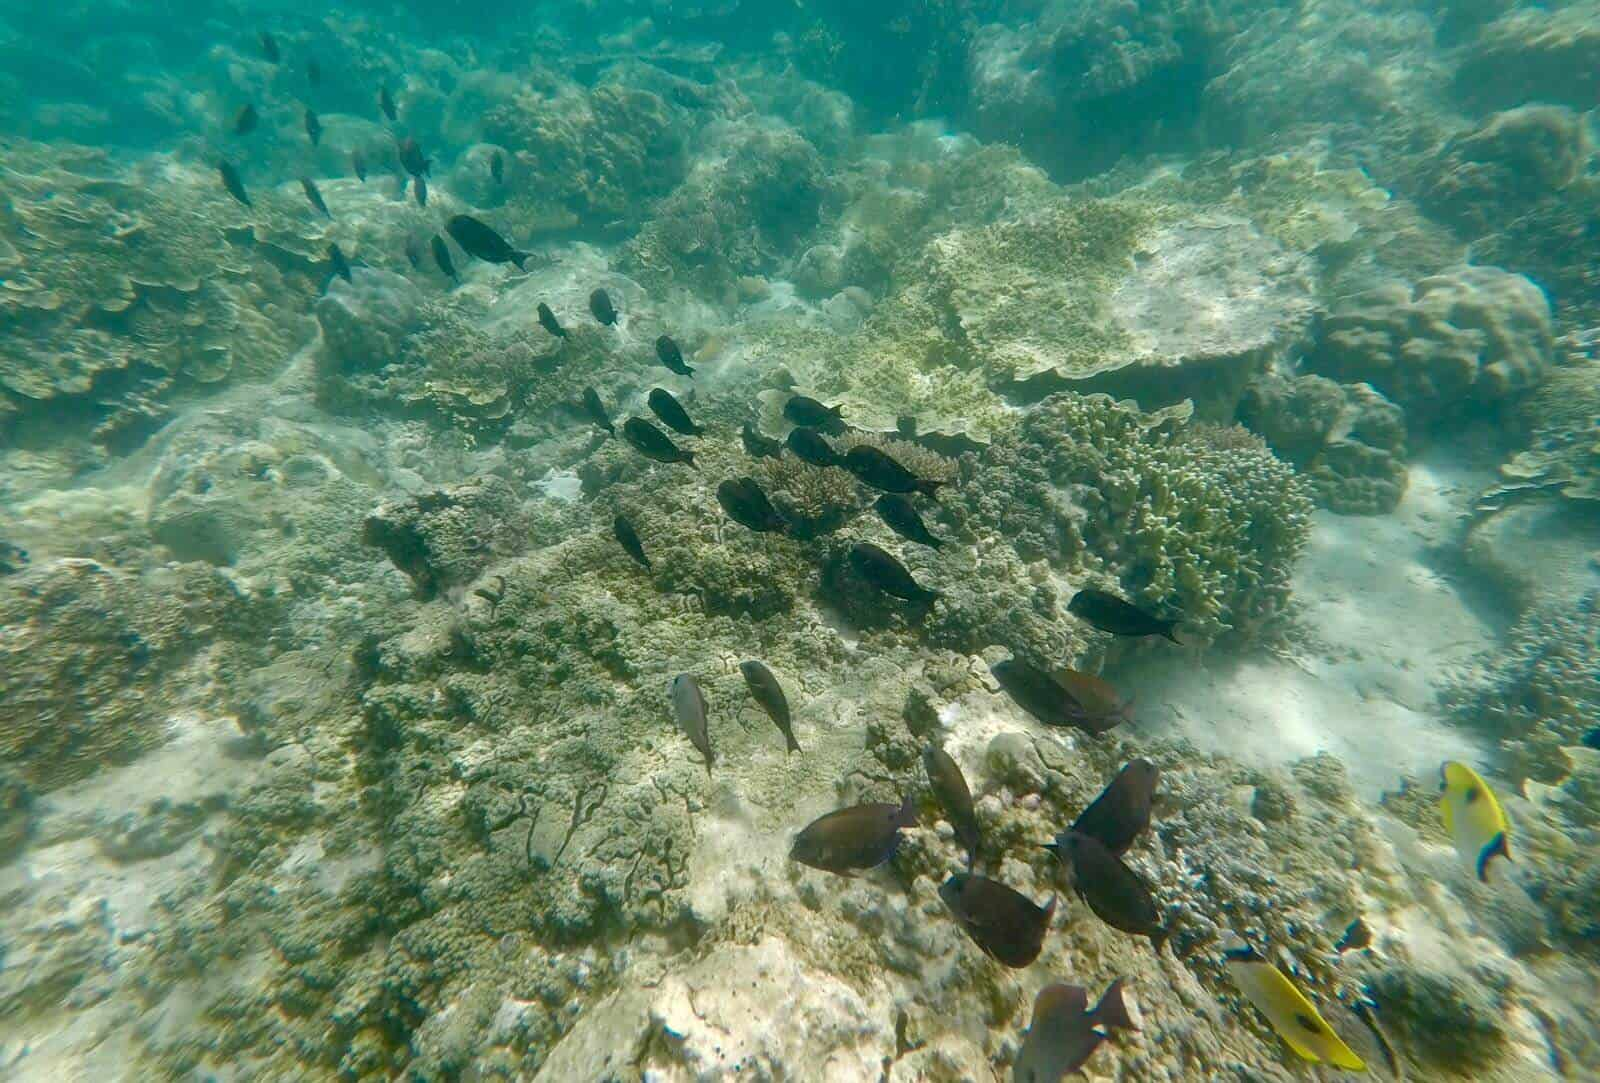 Plenty of Fish Bha Trang Vietnam Snorkelling underwater gopro hero 5 betternotstop